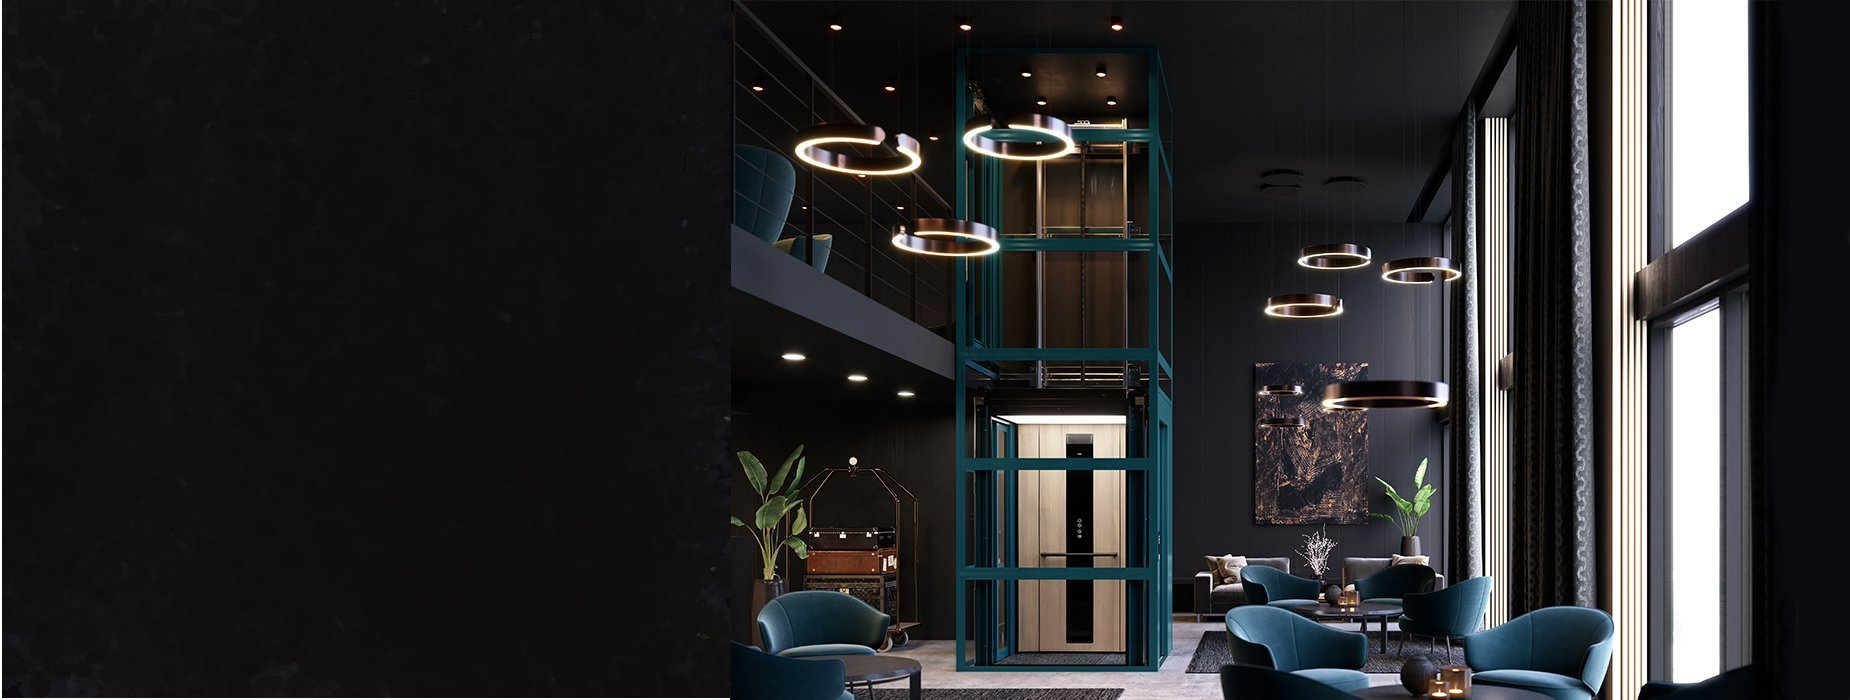 Diseño de ascensor personalizable